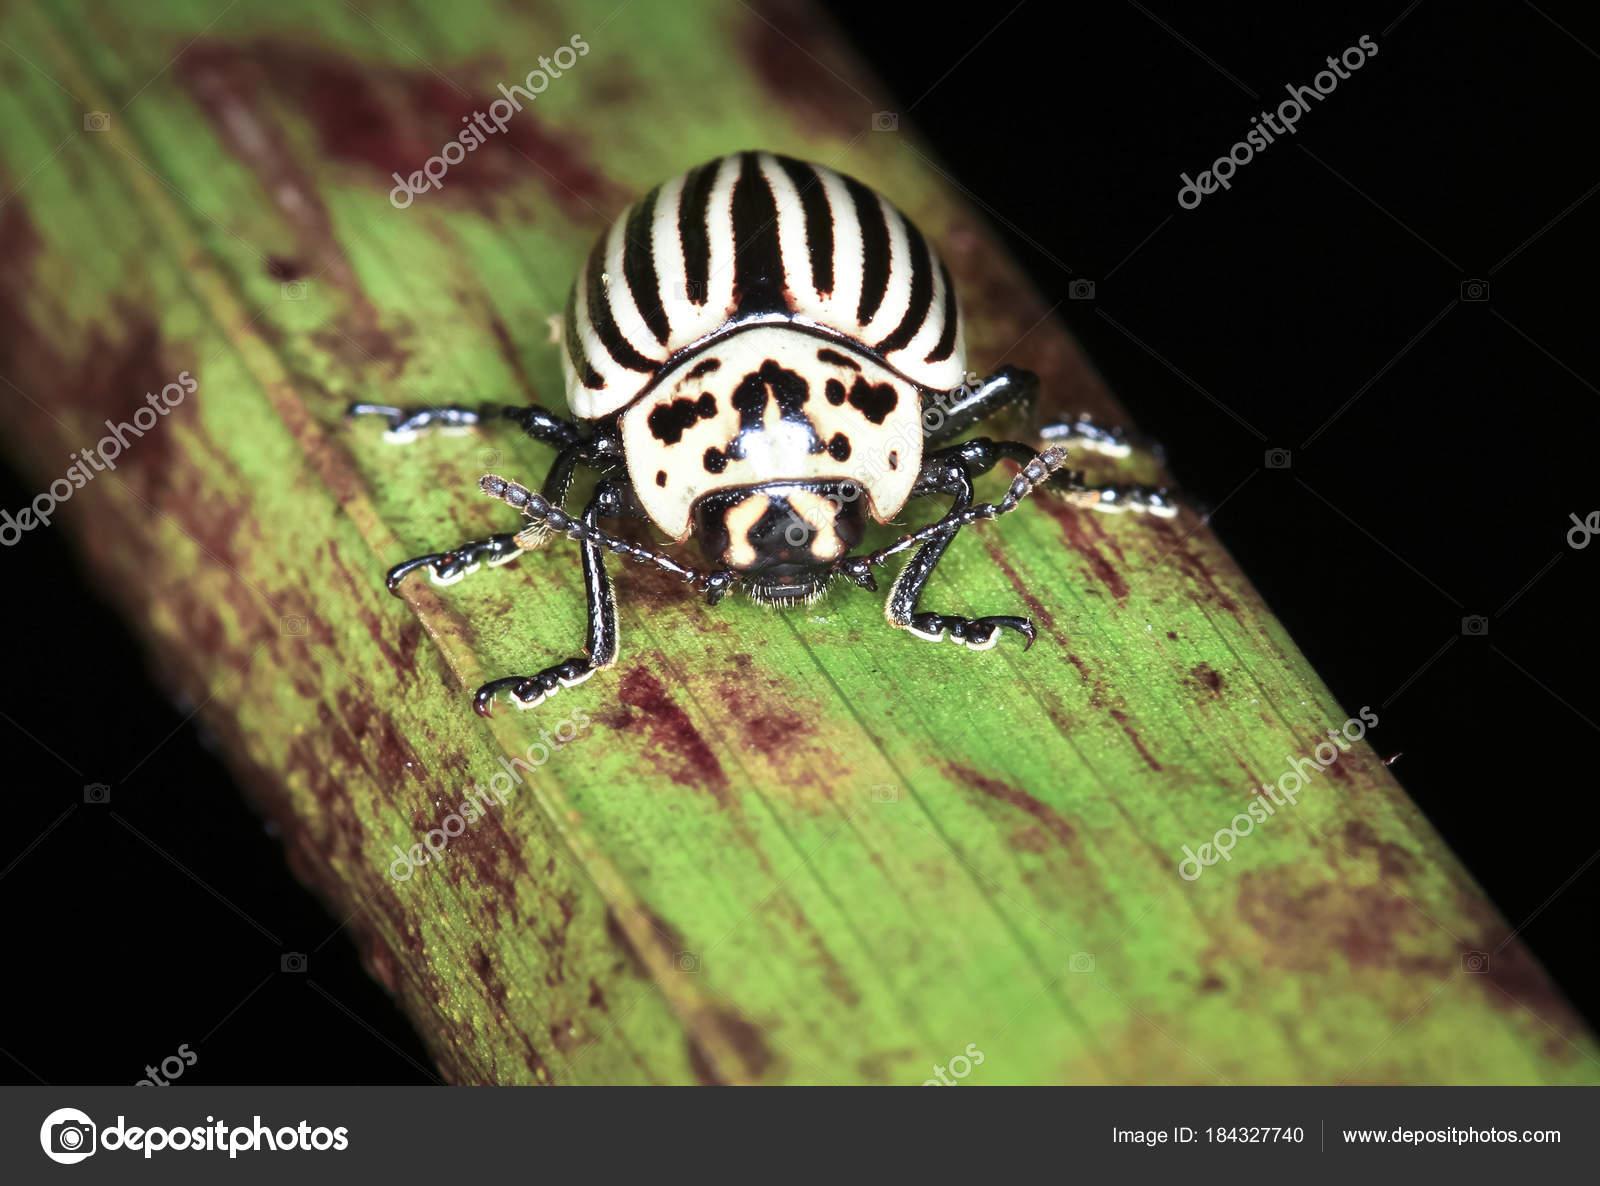 a black belly potato beetle aka leaf beetle leptinotarsa